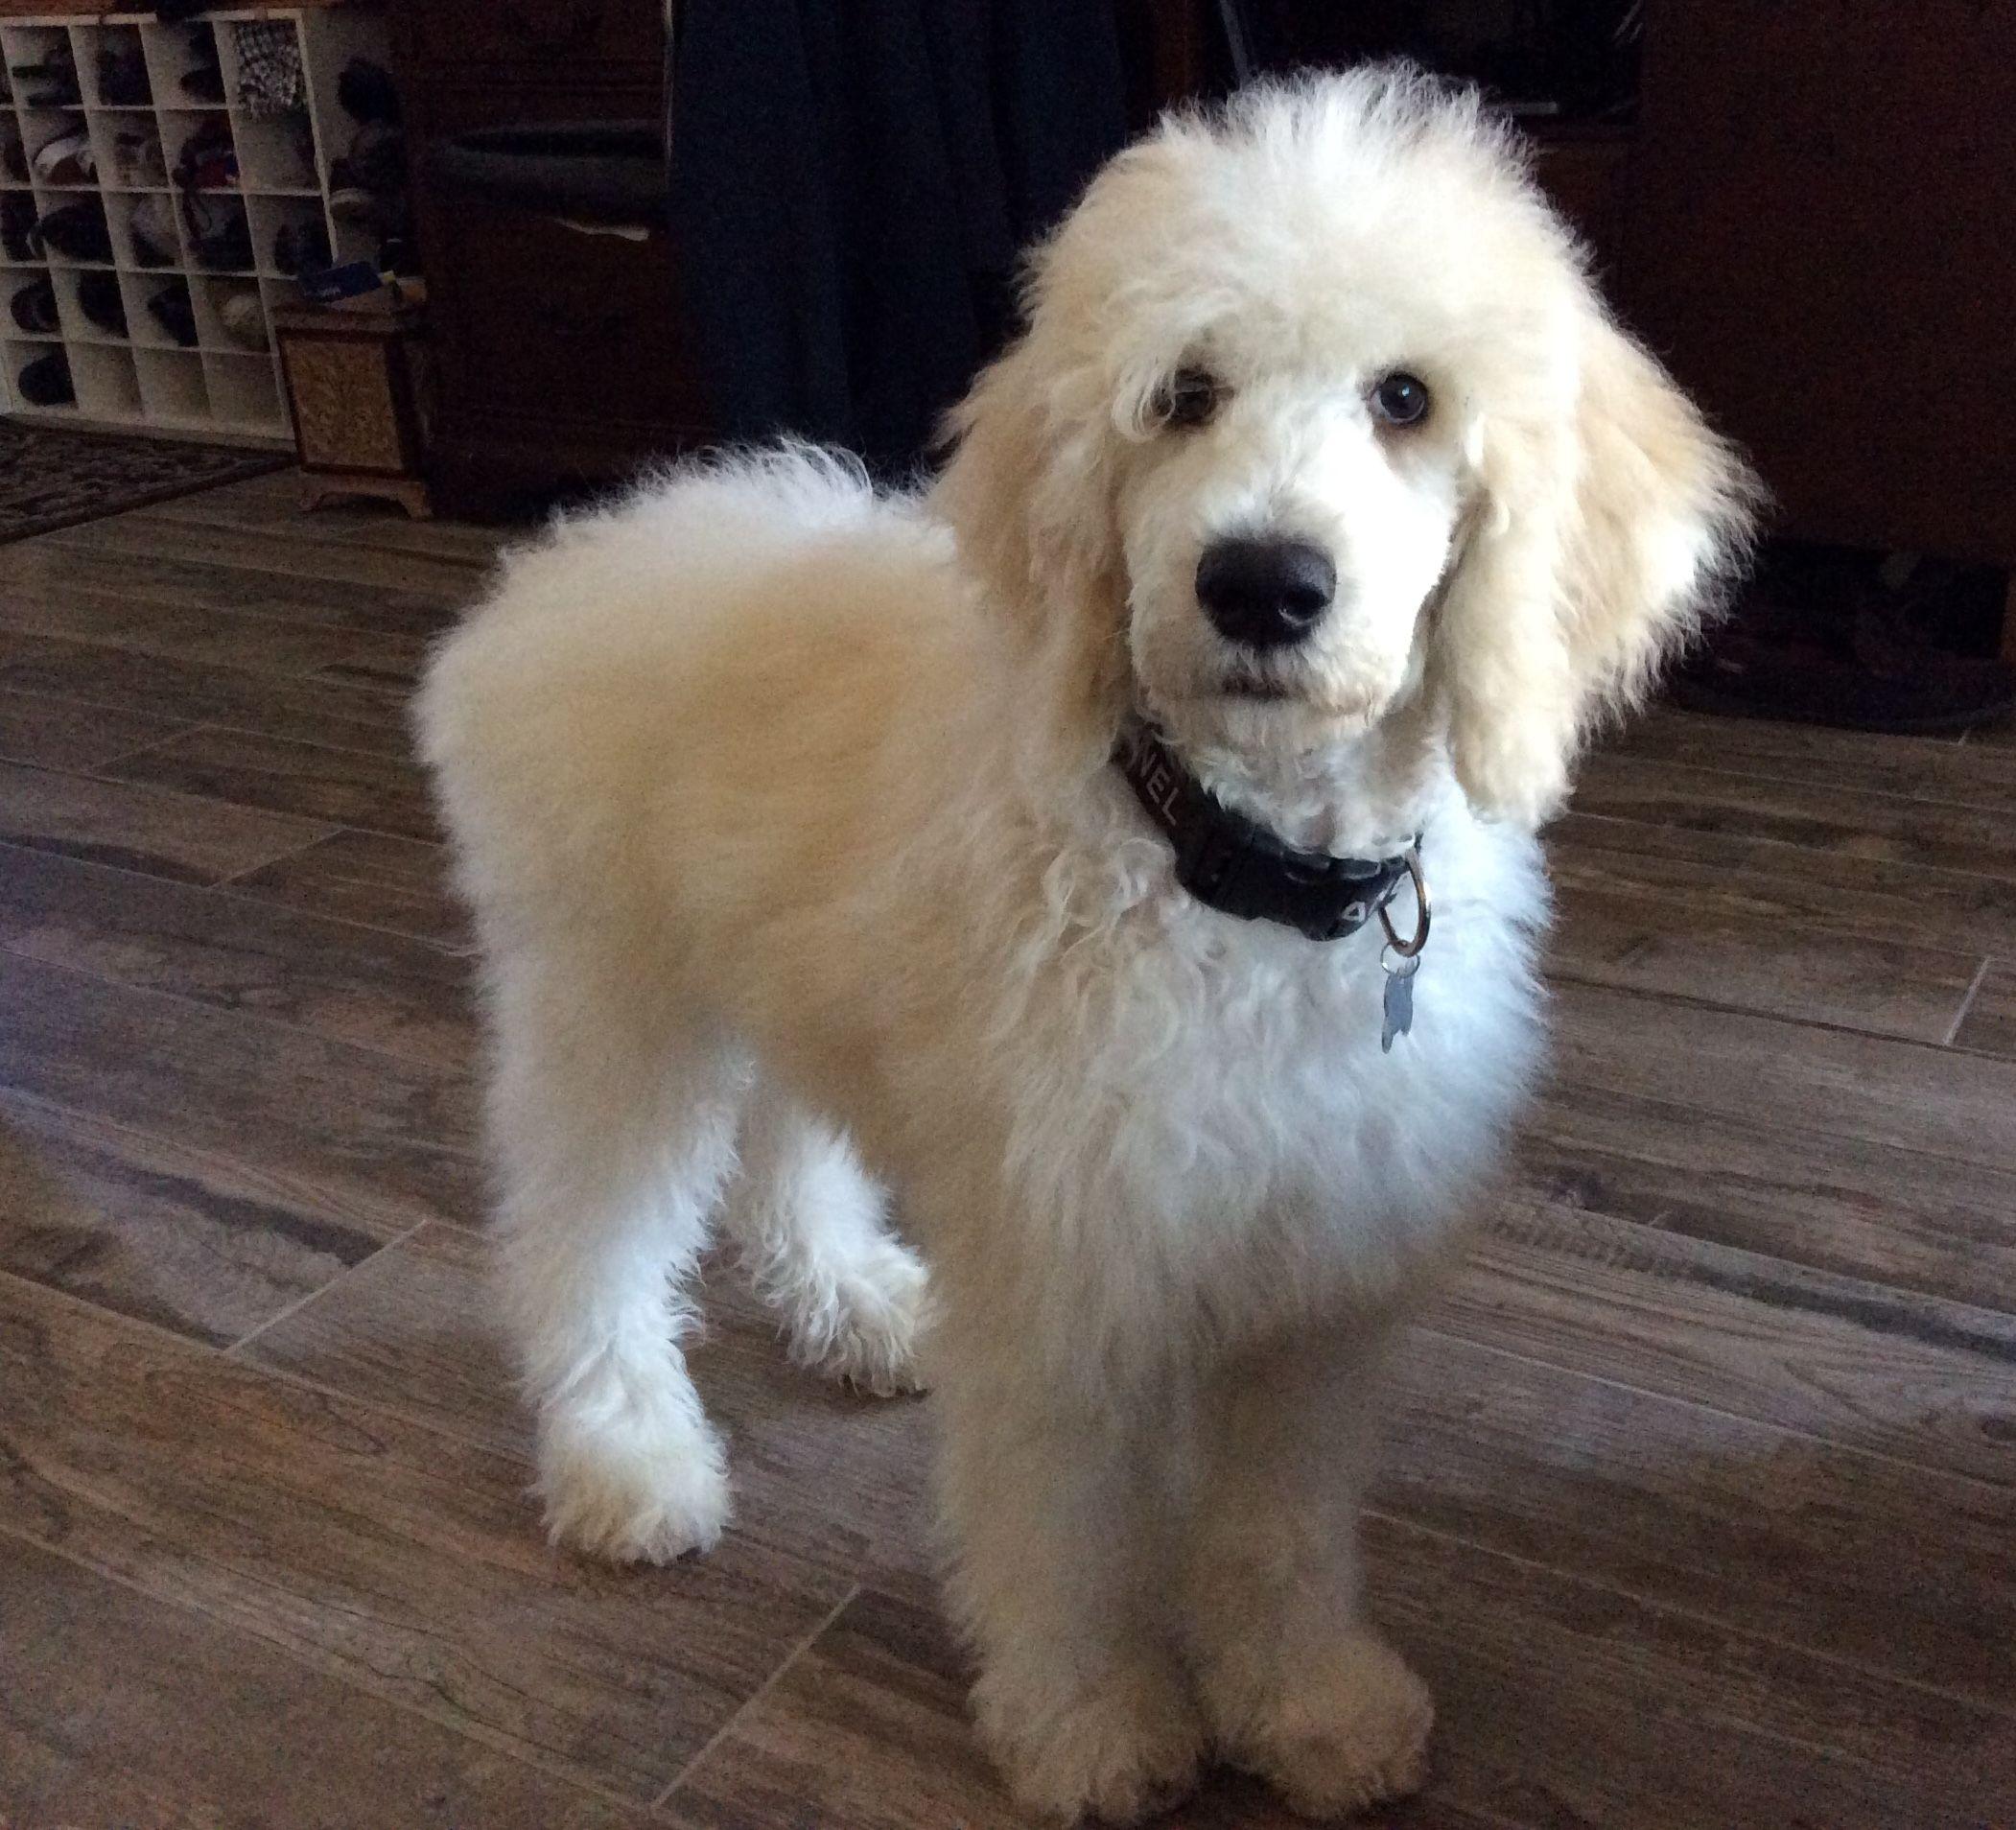 Meet Harley the 15 weeks old Standard Poodle. Dogs